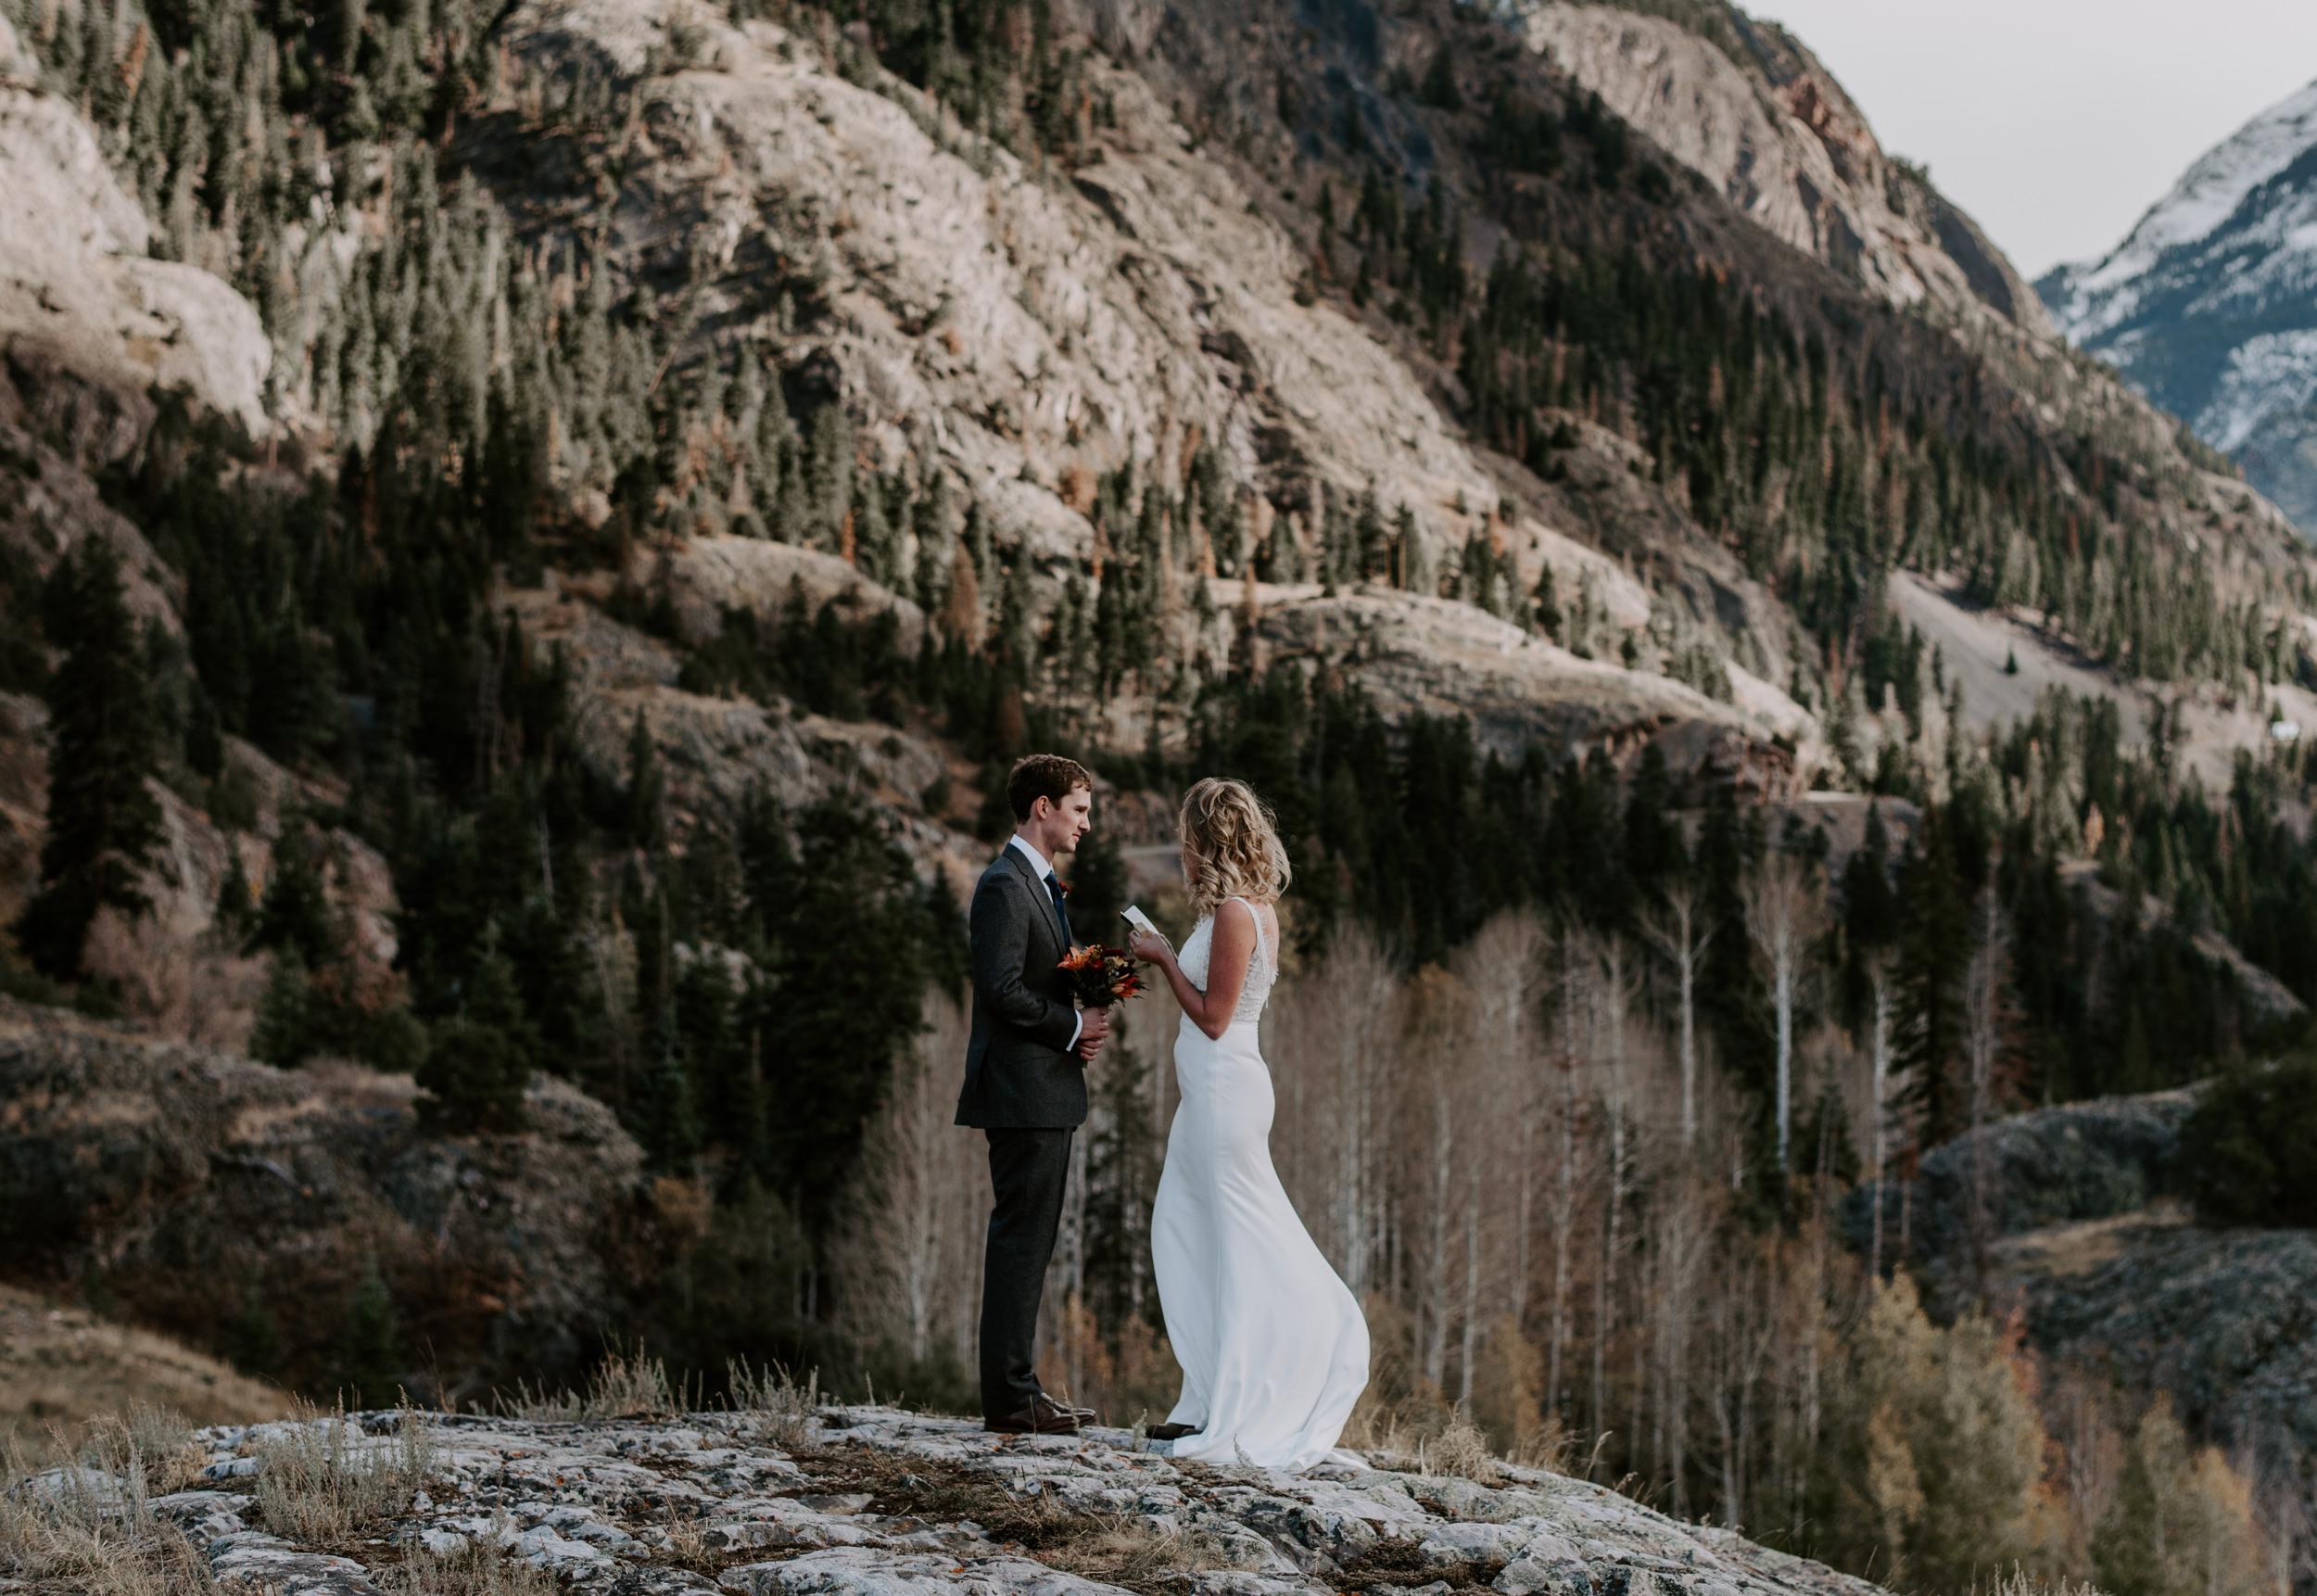 Ouray, Colorado elopement ceremony.